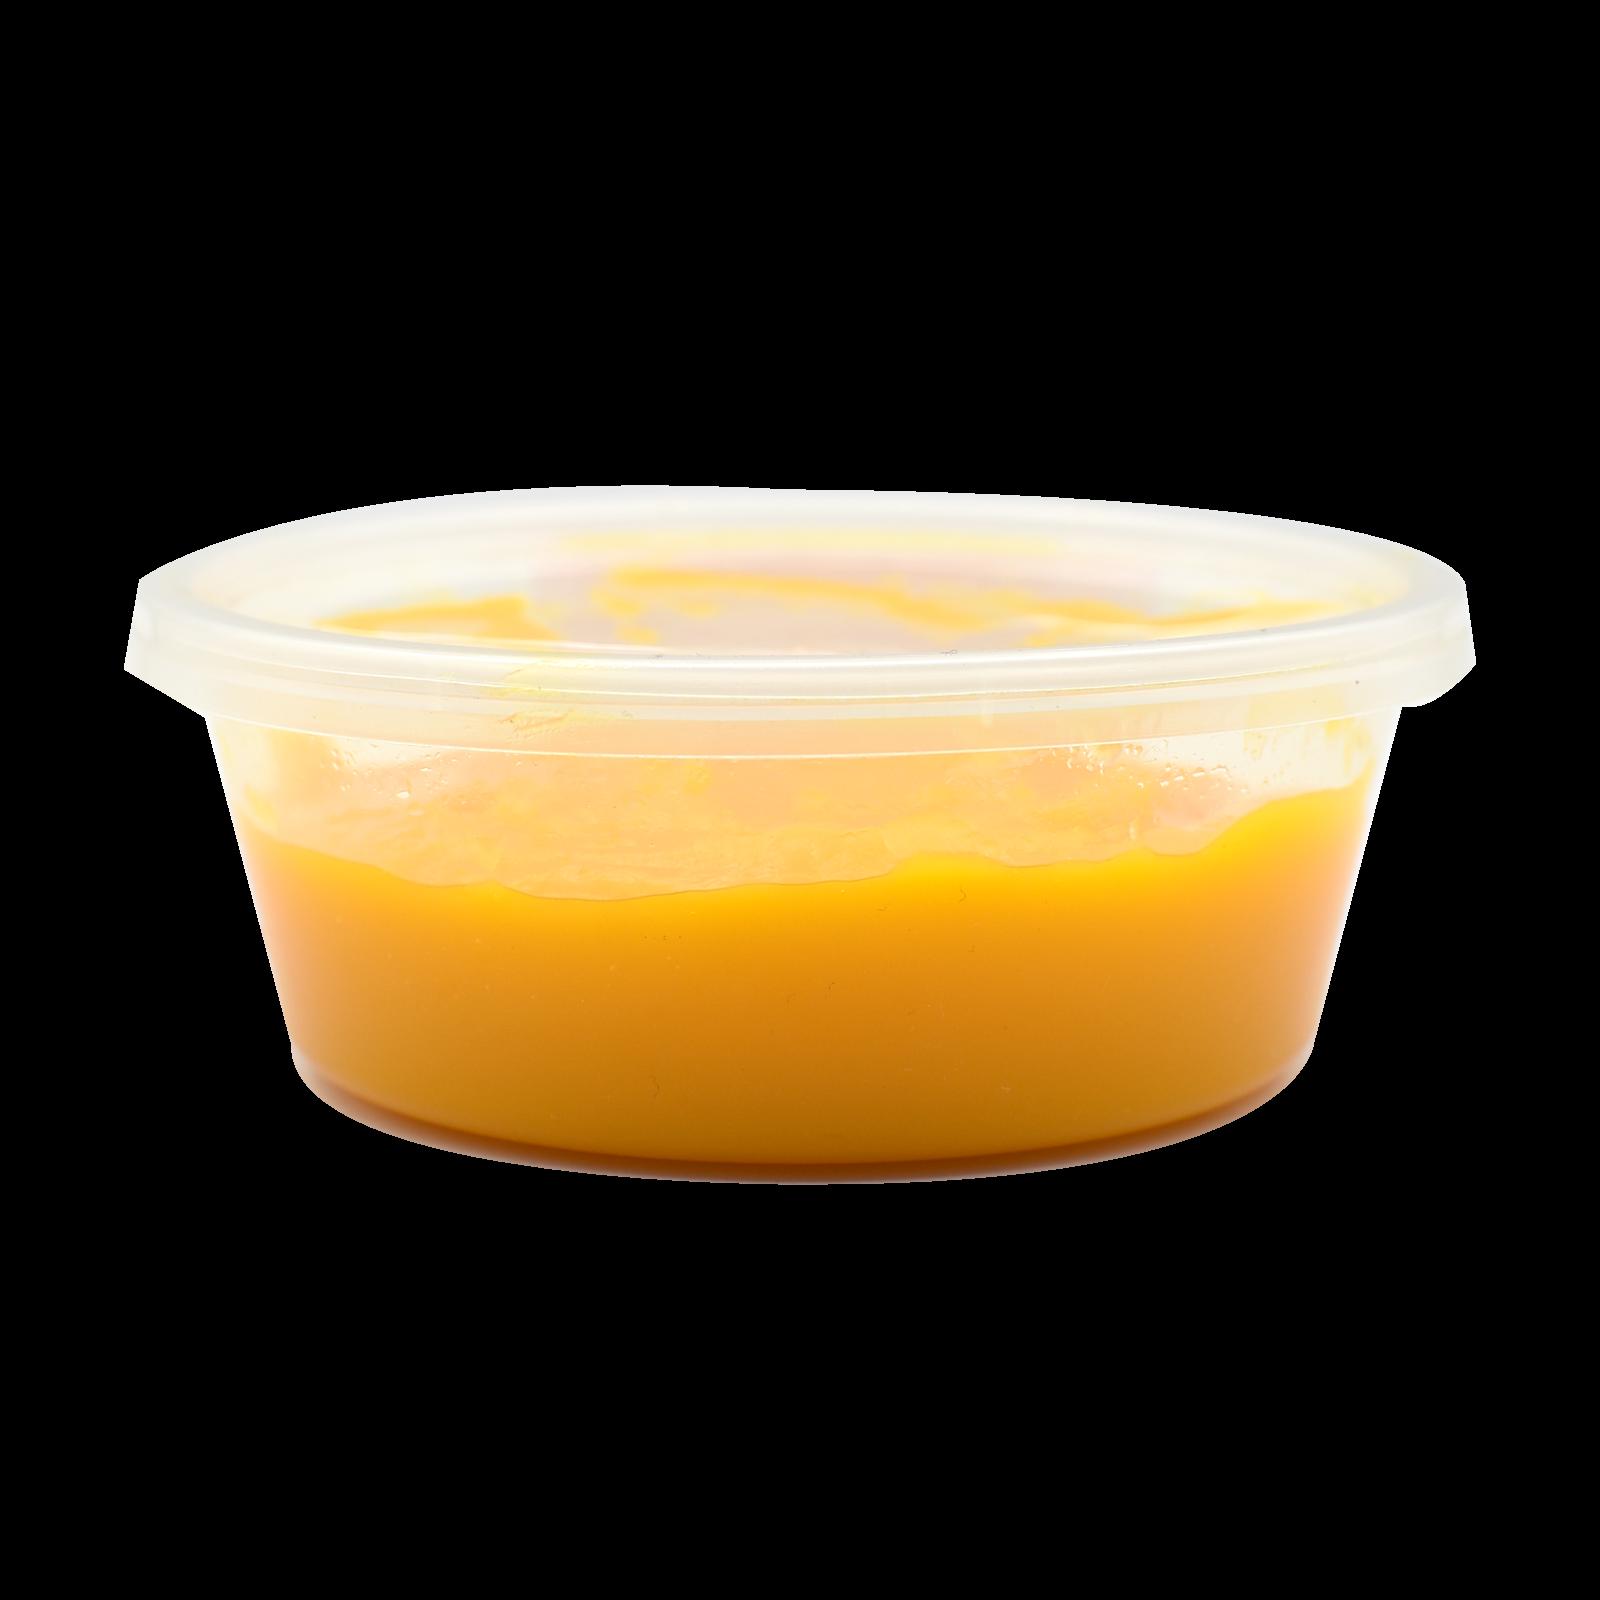 Bakels Golden Sauce 200gm.png